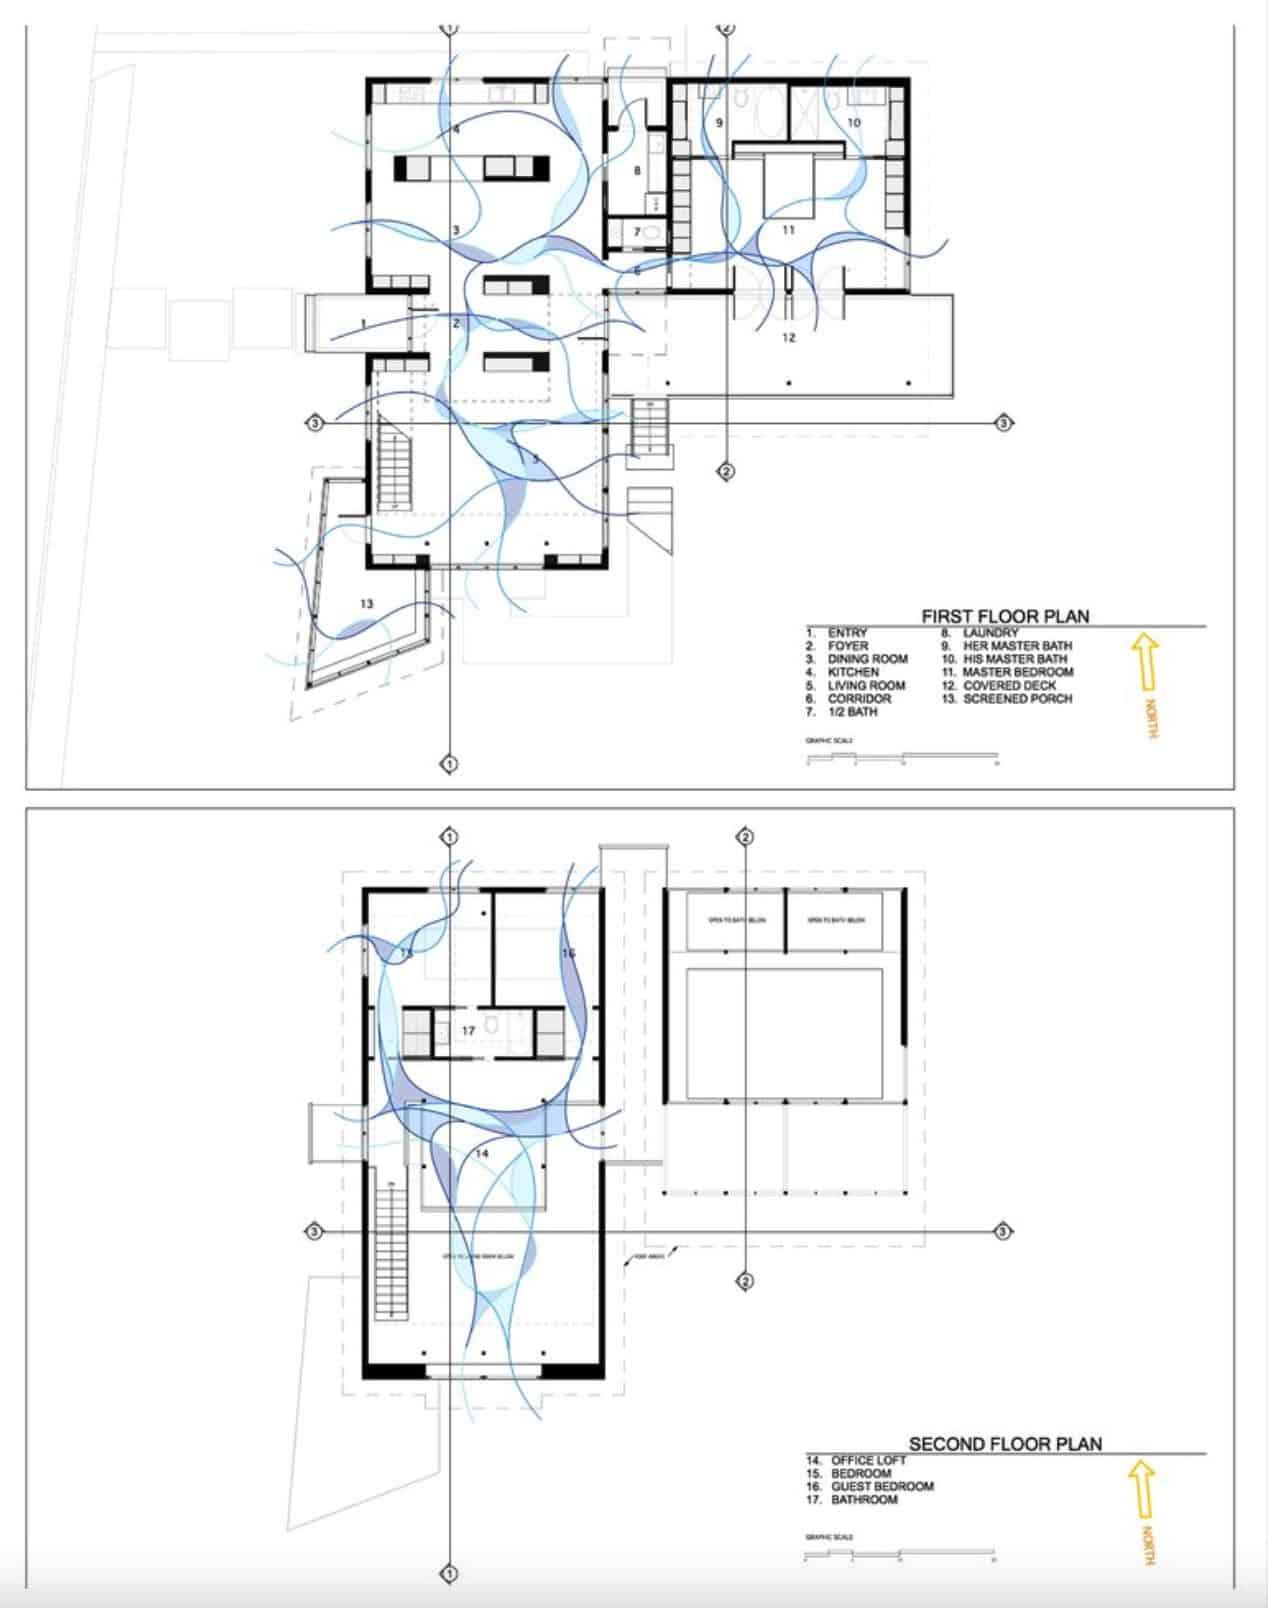 leed-platinum-certifited-modernist-house-floor-plan